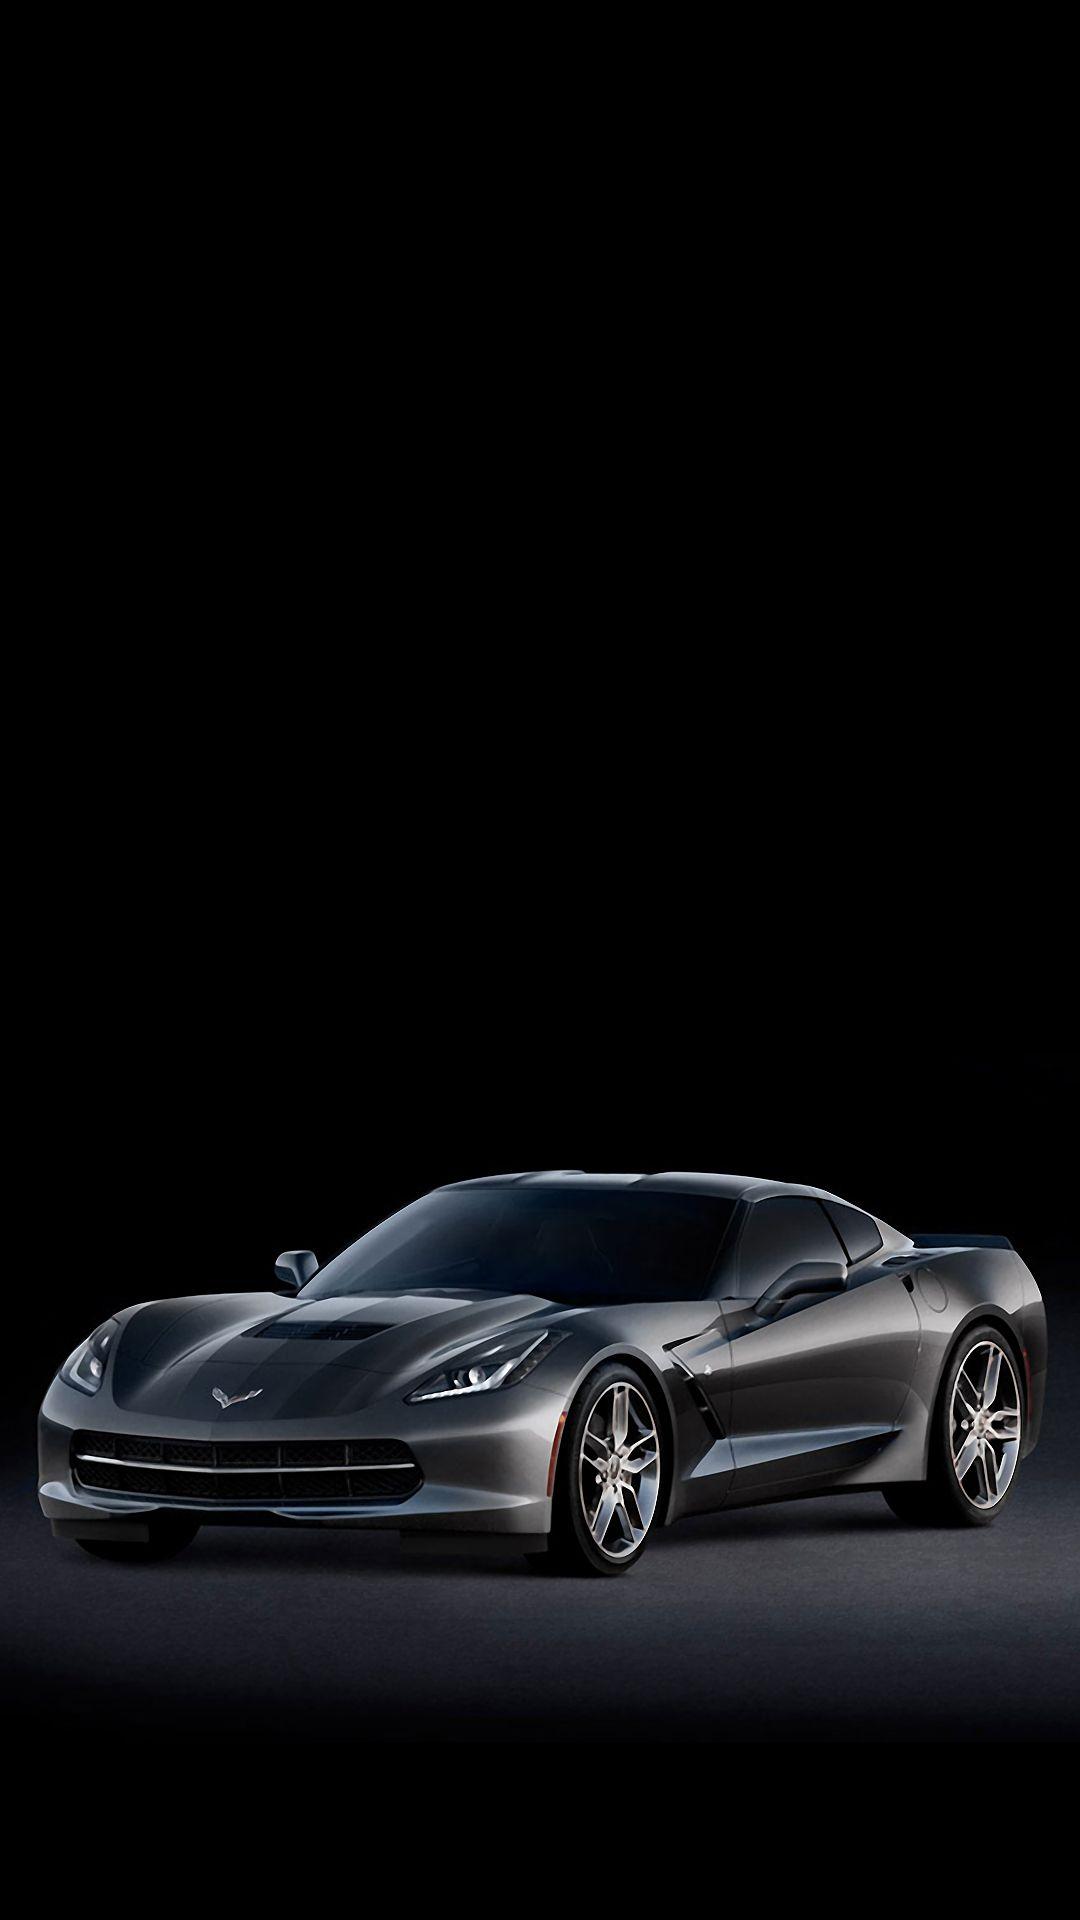 C Corvette Stingray Side Iphonesiphones Wallpaper